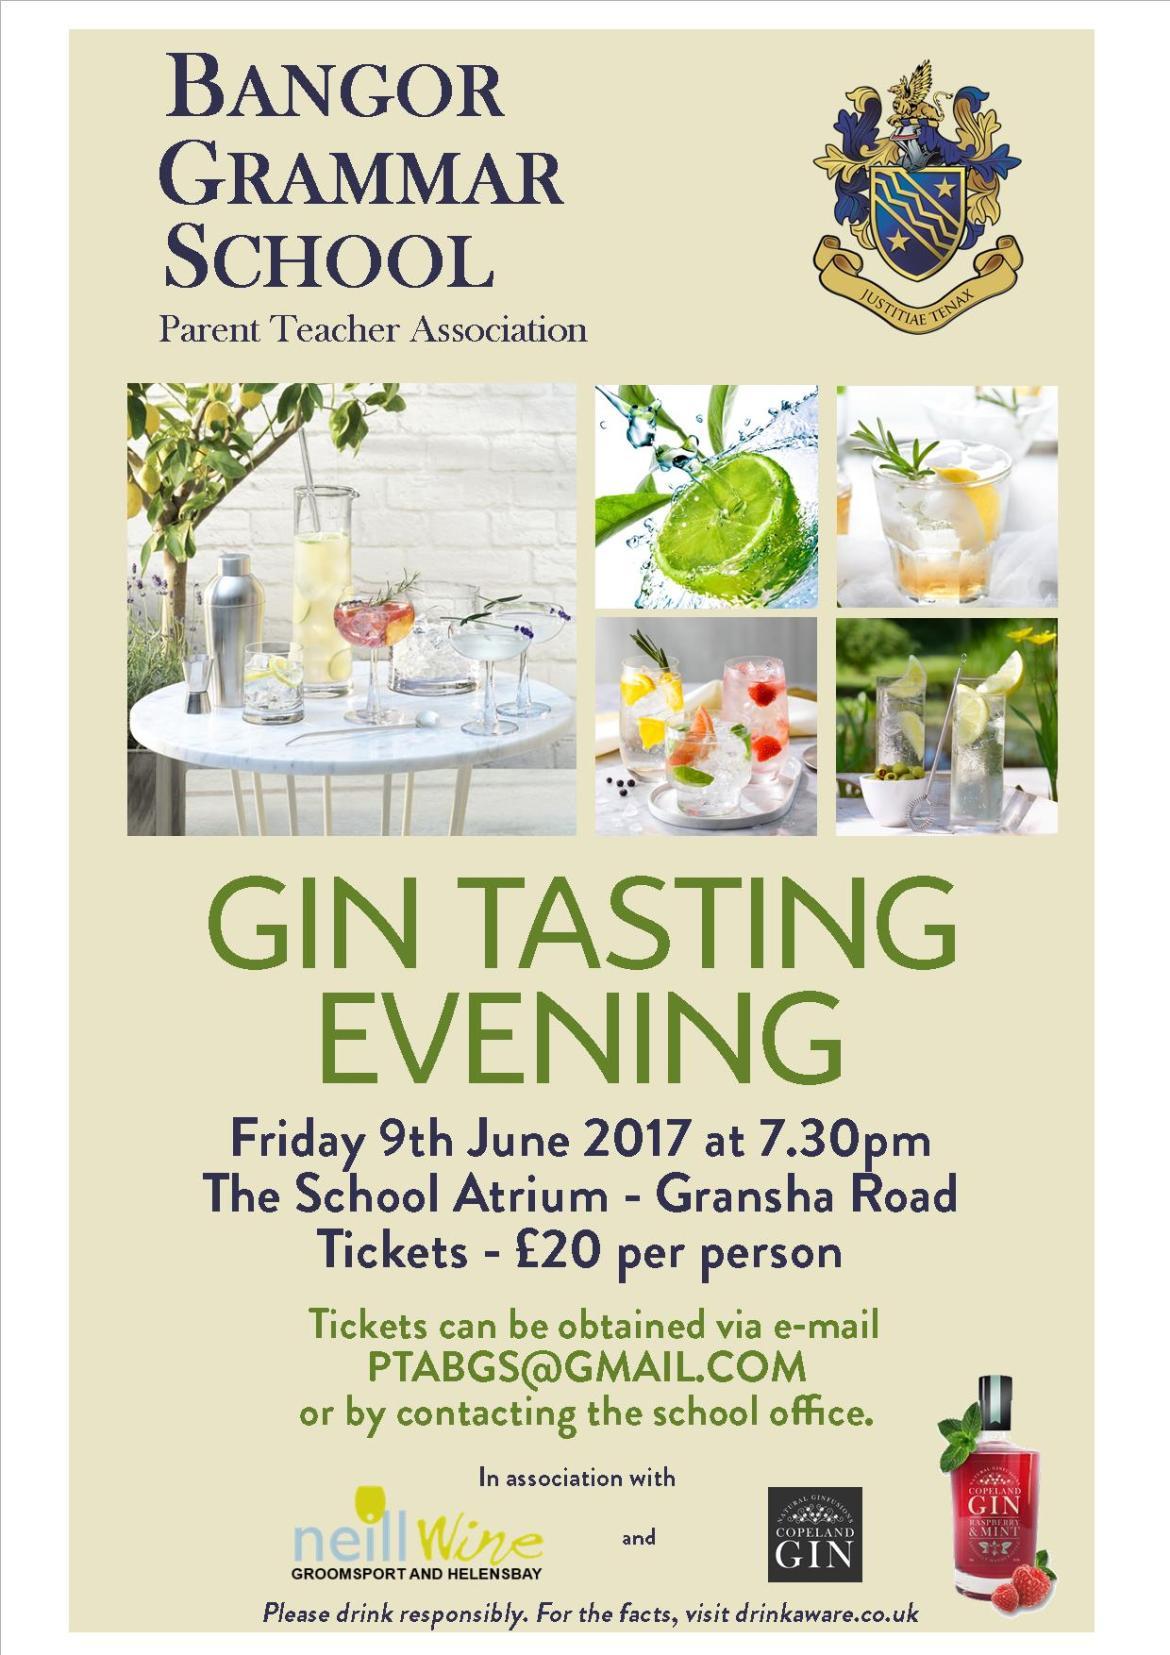 gin-tasting-evening-june-2017